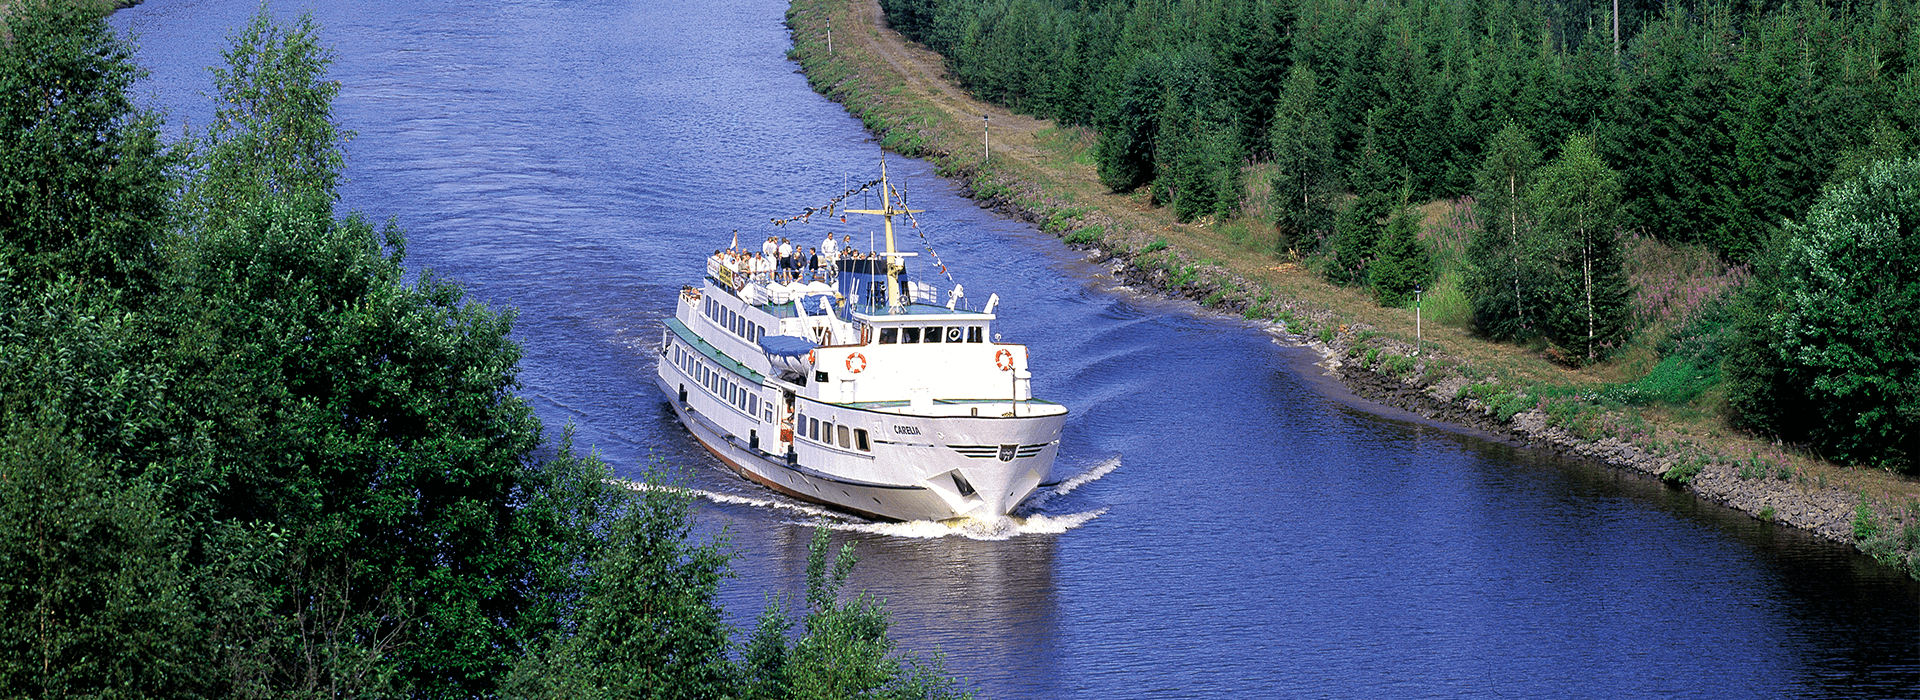 M/S Carelia, Saimaan kanava